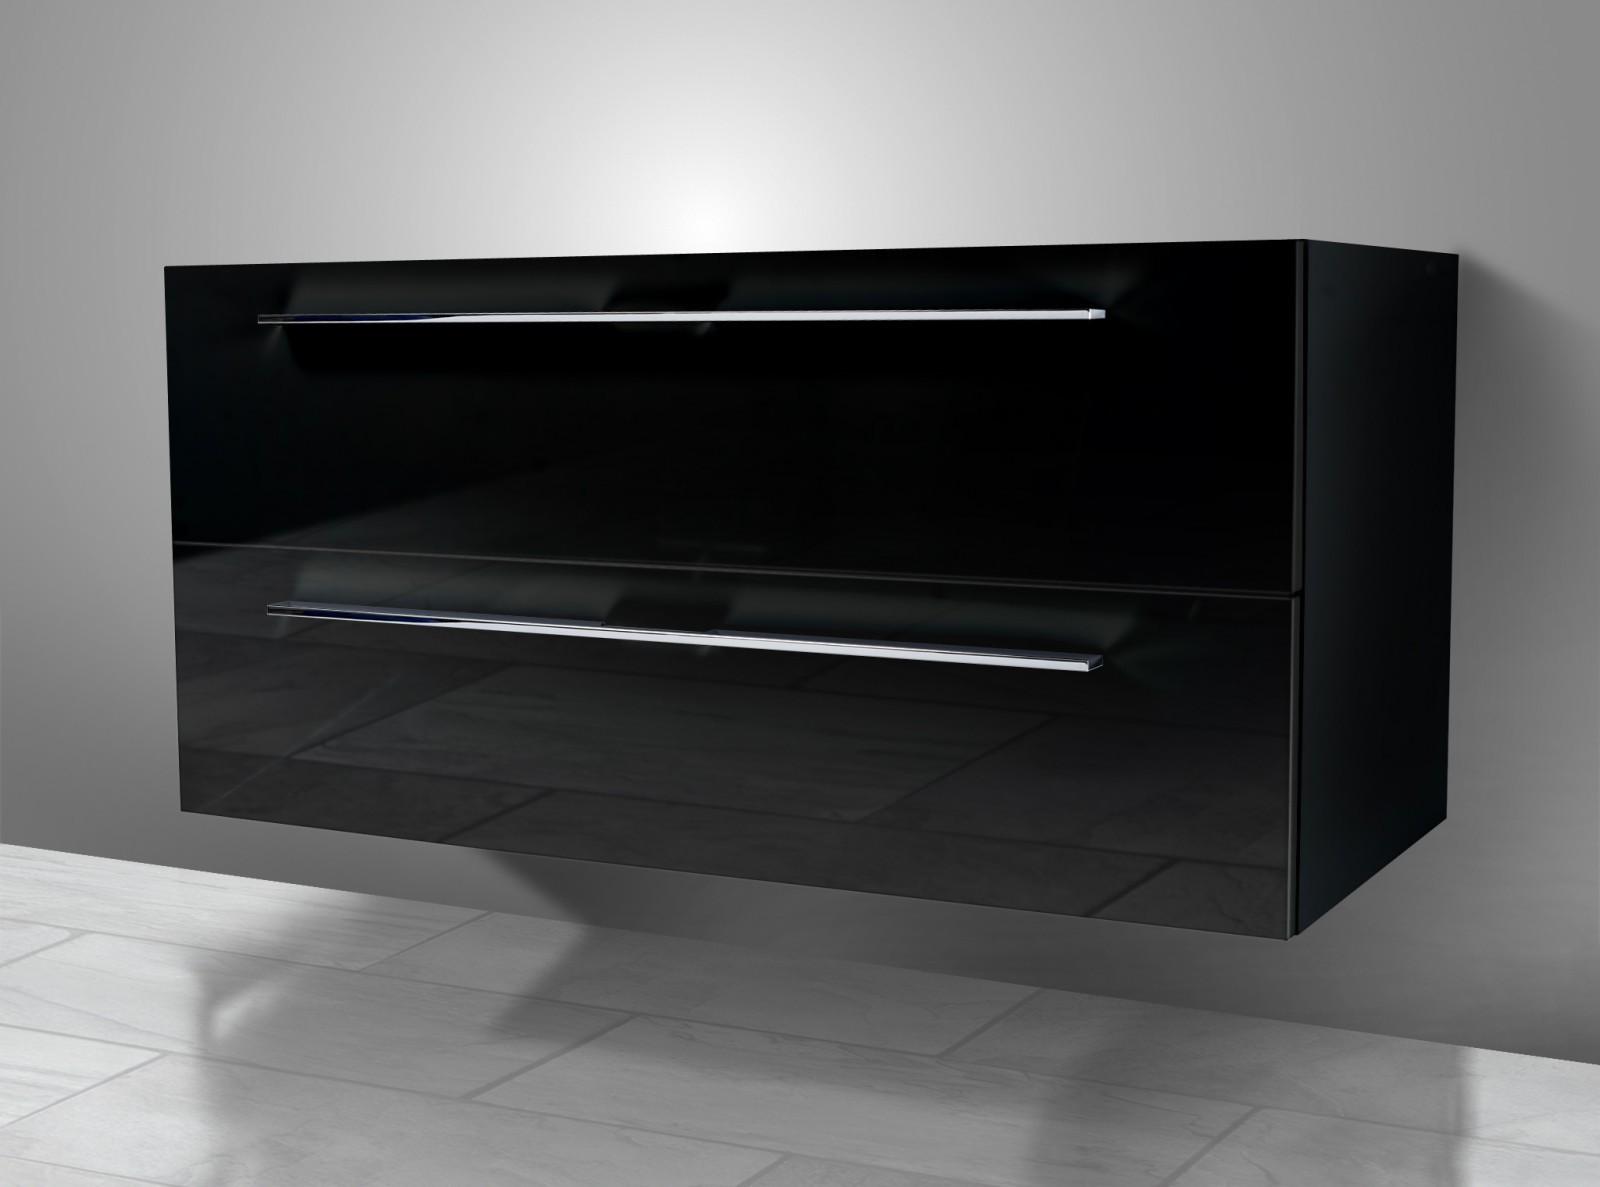 unterschrank f r ideal standard daylight 100 cm. Black Bedroom Furniture Sets. Home Design Ideas